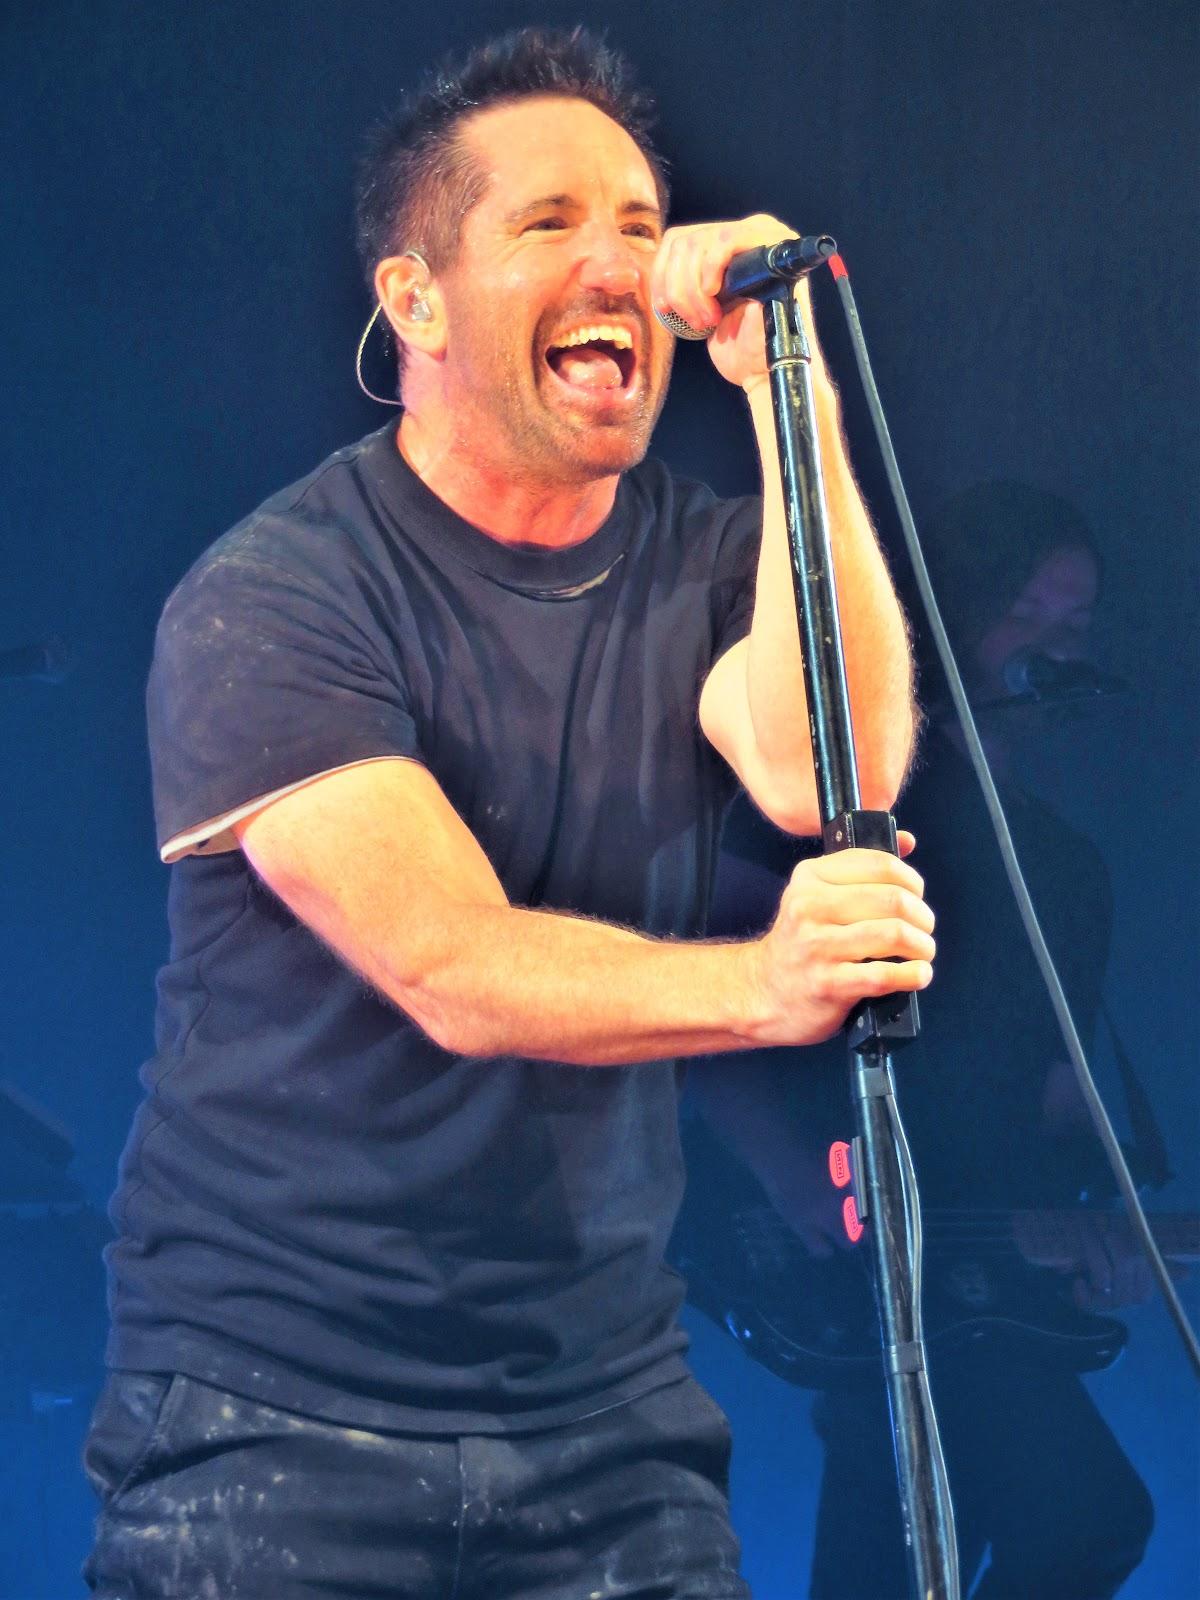 Play Nine Inch Nails : nails, Manhattan, Beat:, Nails, Radio, Music